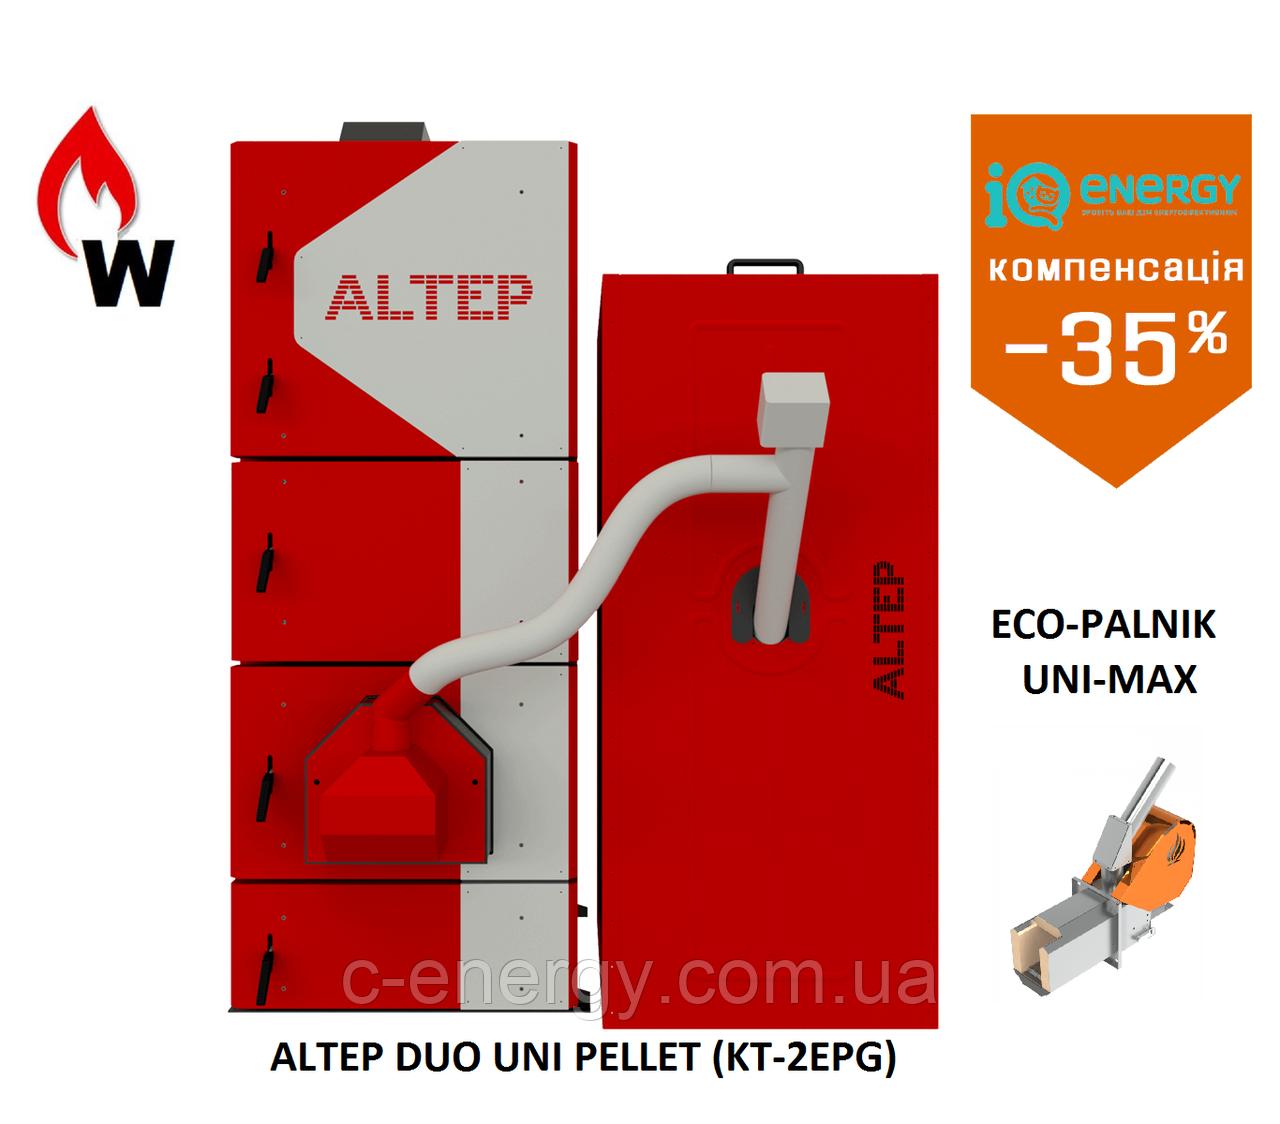 Пелетный  котел Altep Duo Uni Pellet 40 кВт (KT-2EPG) +Eco-Palnik Uni-MAX, фото 1